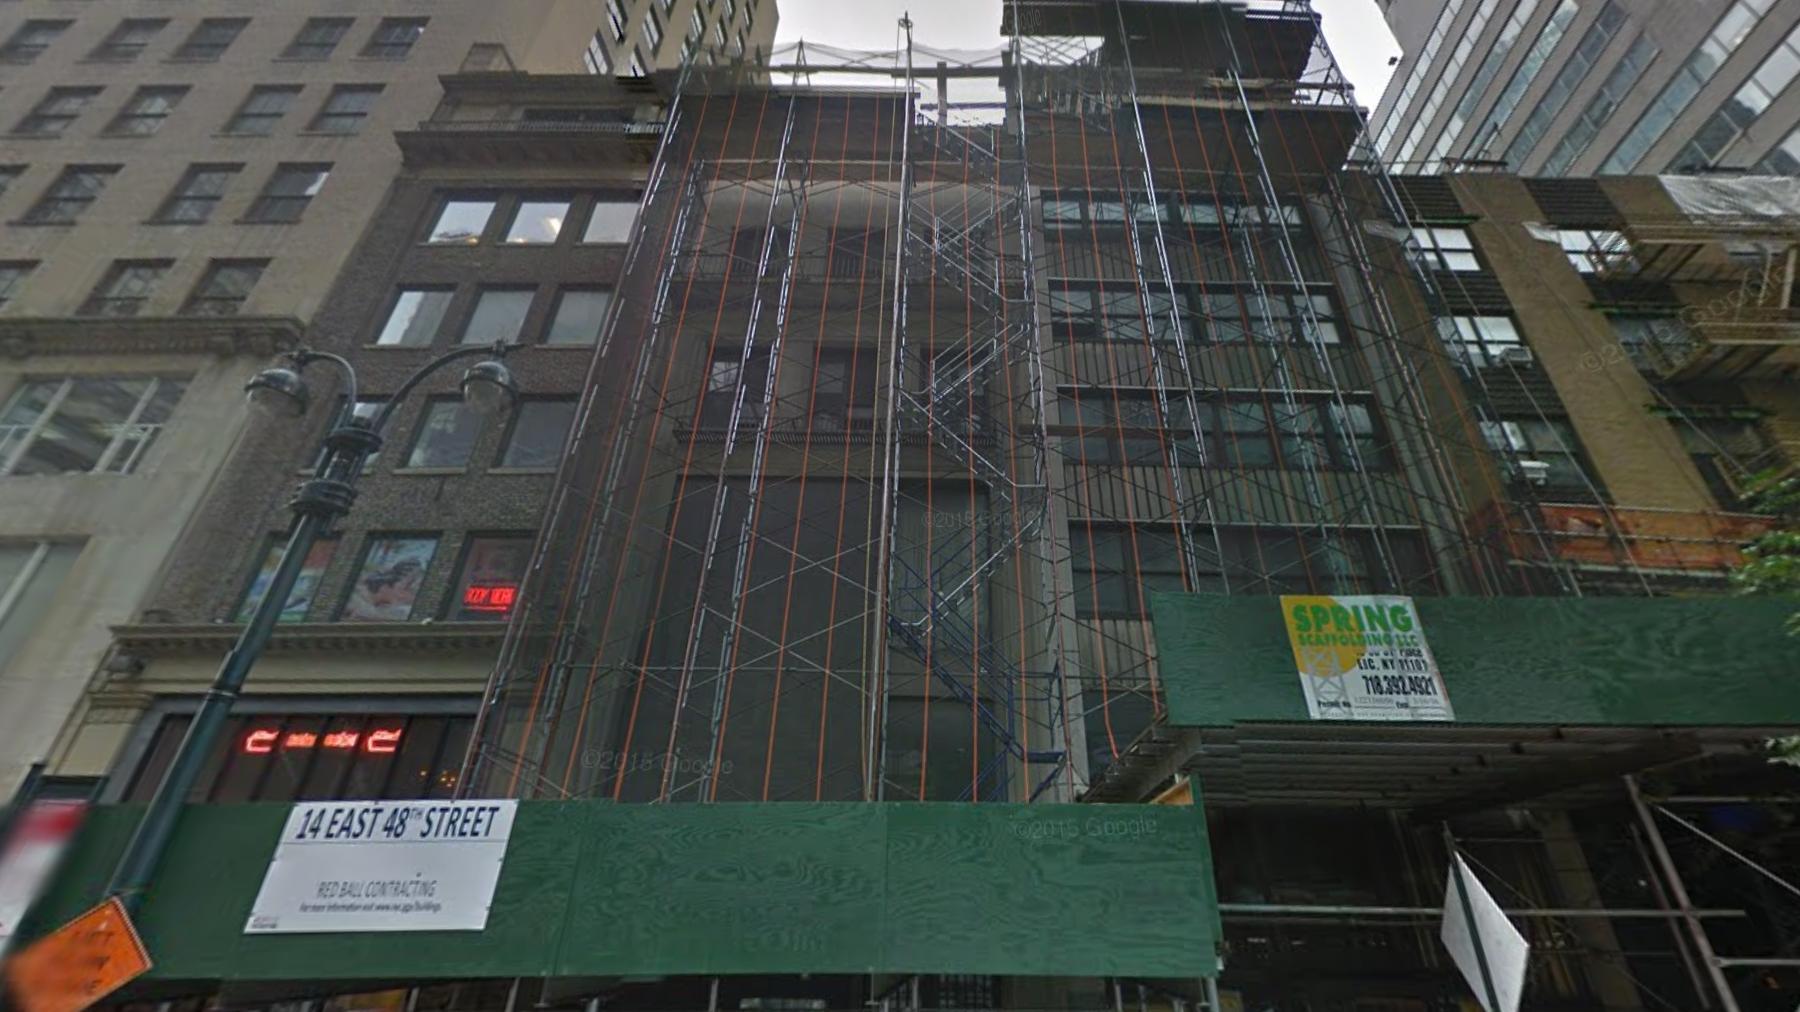 12 East 48th Street